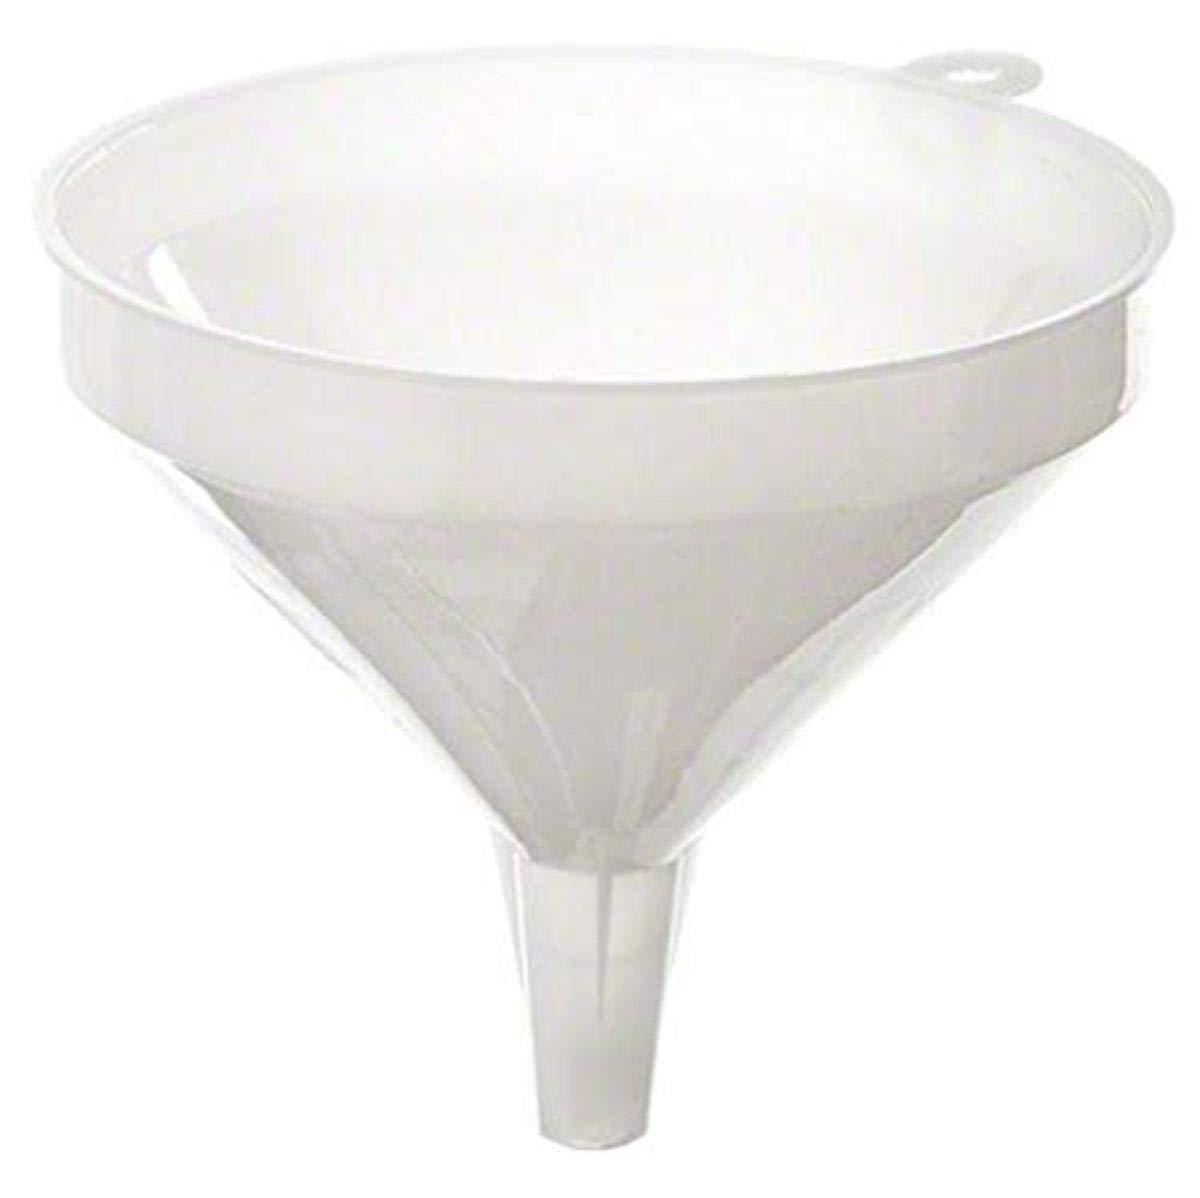 "Update International (FPW-5) 5-1/4"" Plastic Funnel"